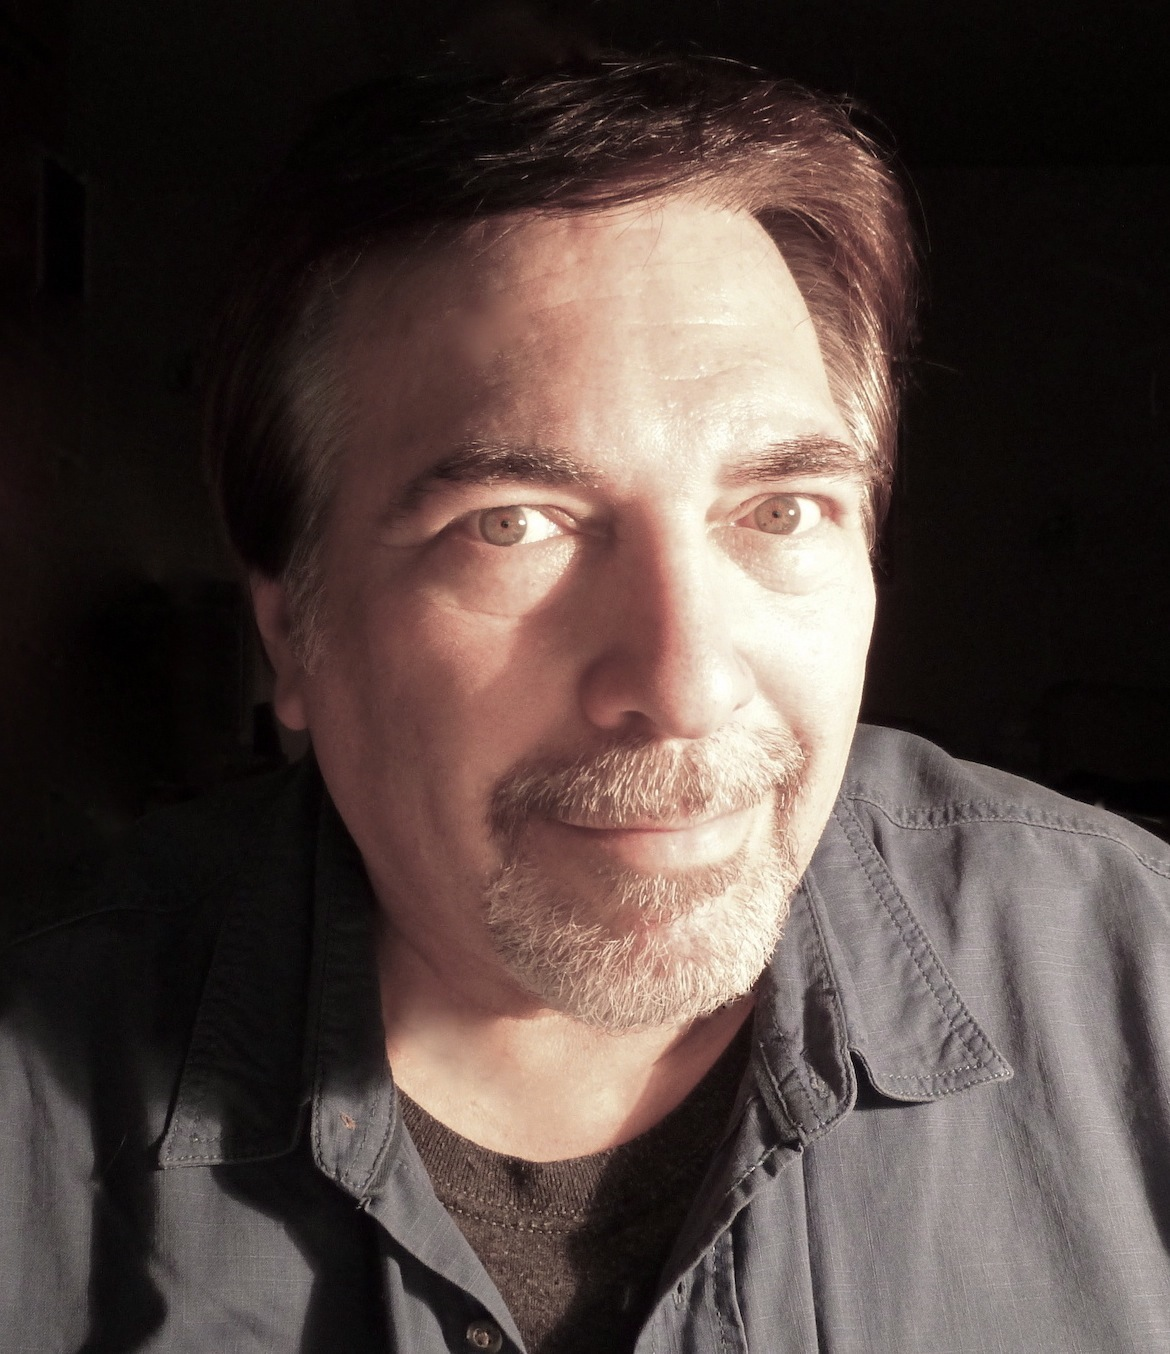 Lee Speigel, reporter